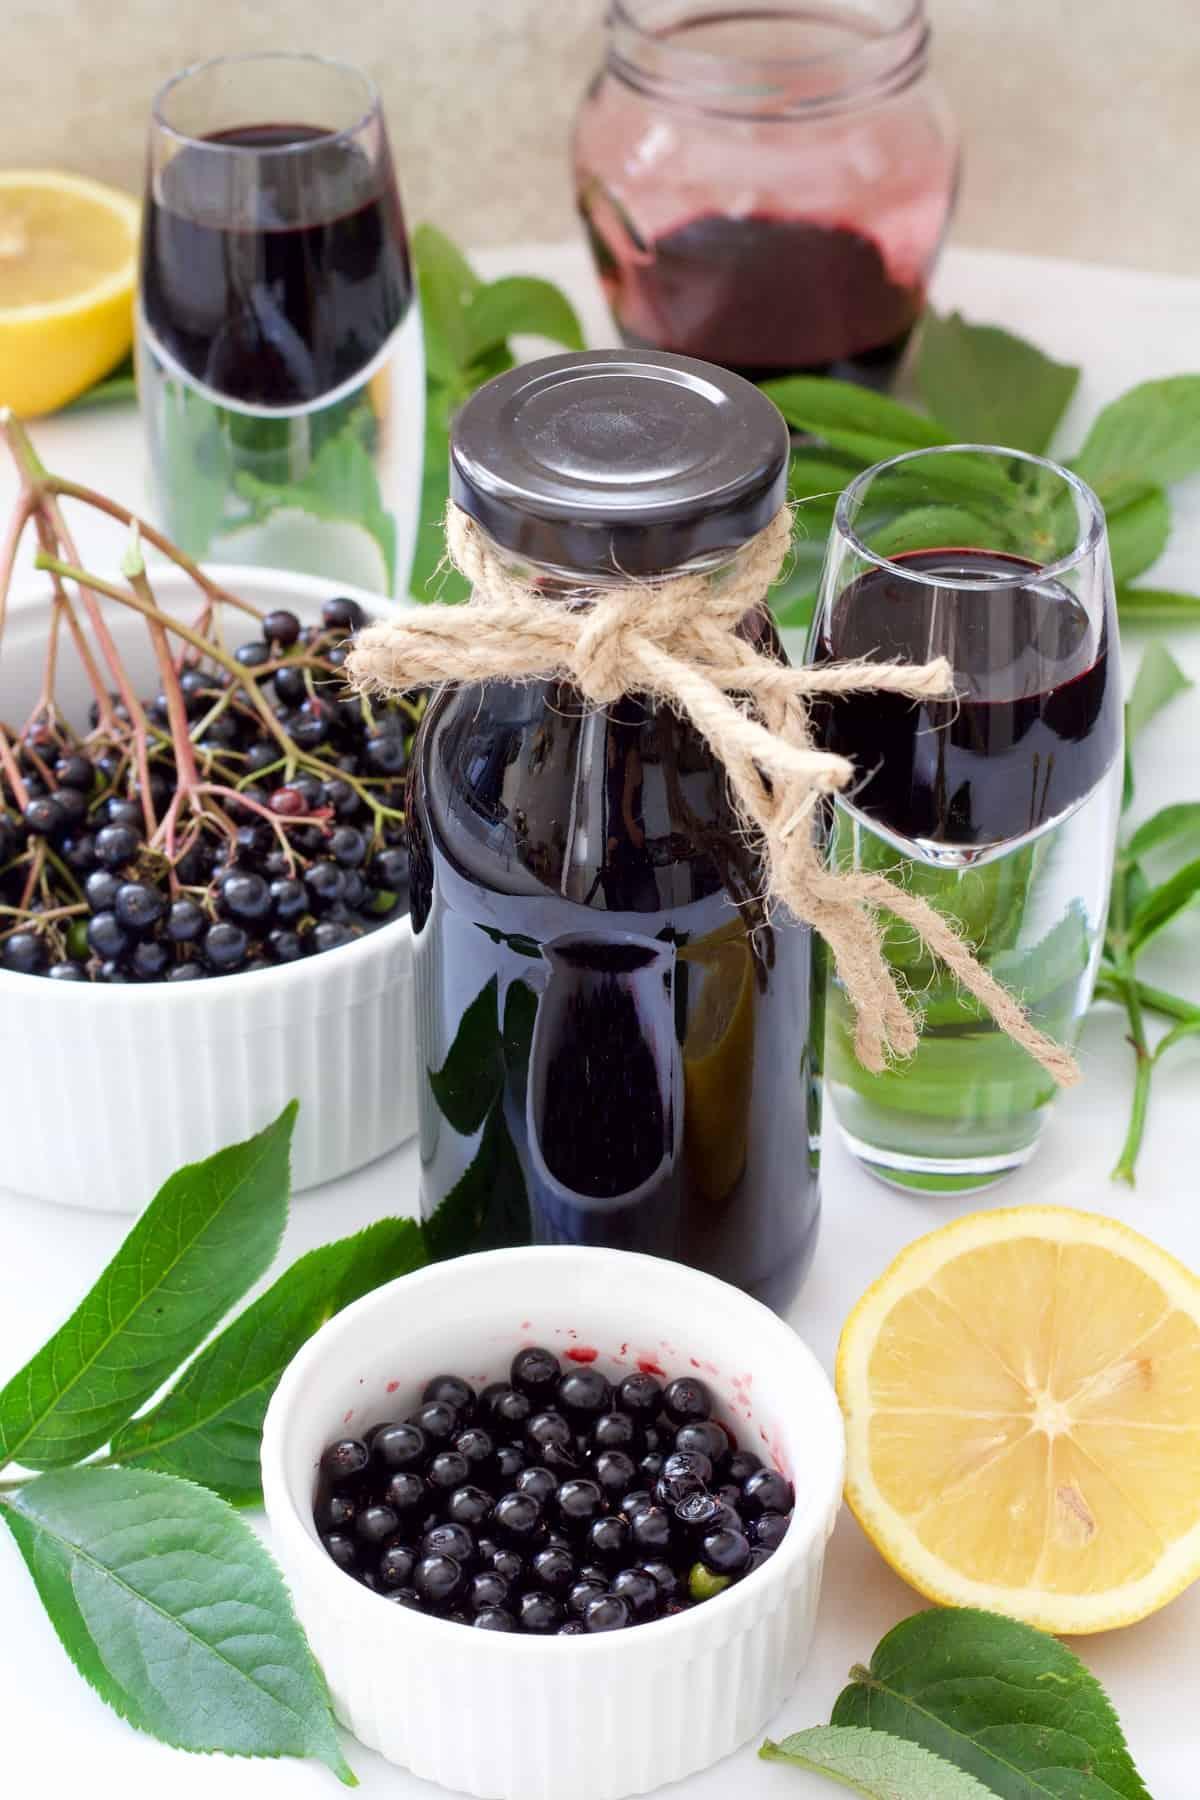 Fresh elderberries in bowls, syrup in bottle and shot glasses.